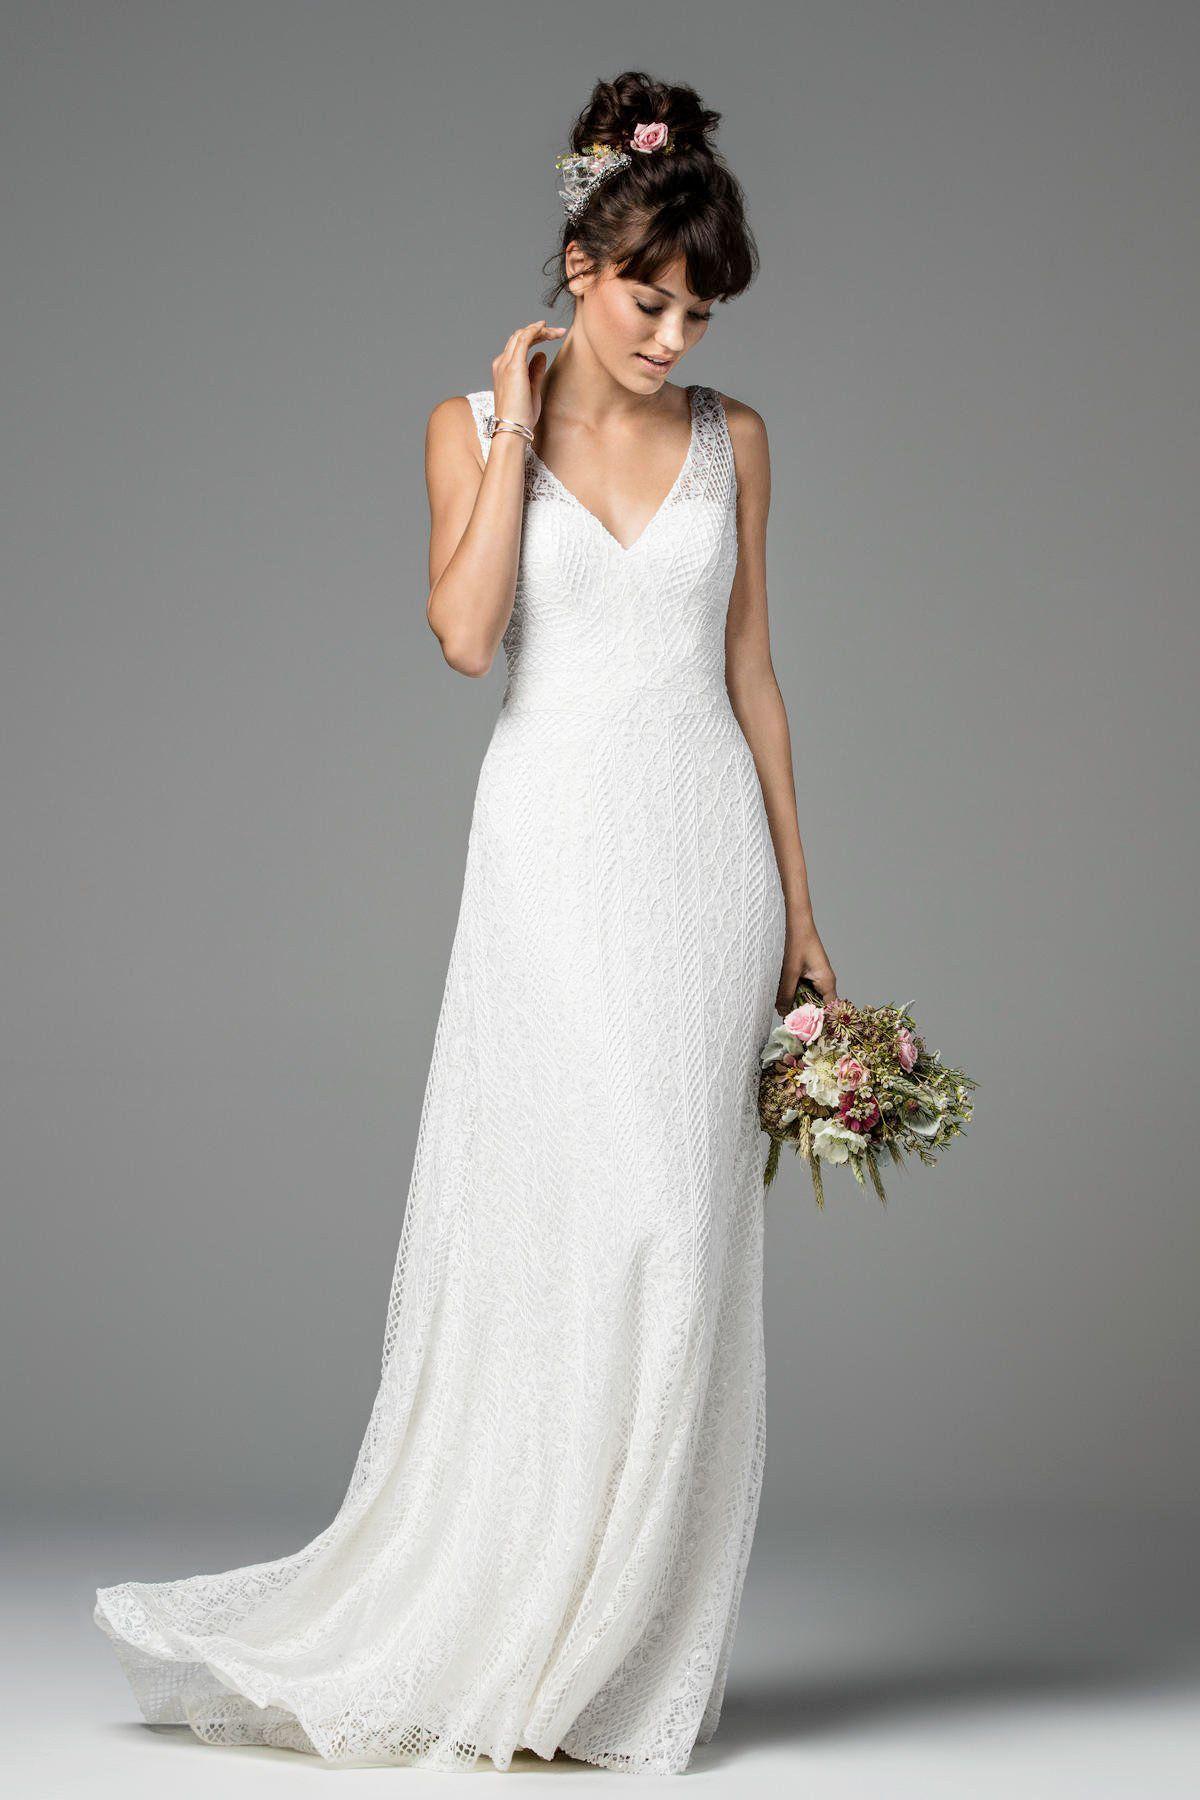 Brighton beaded wedding dress ideas pinterest dress ideas